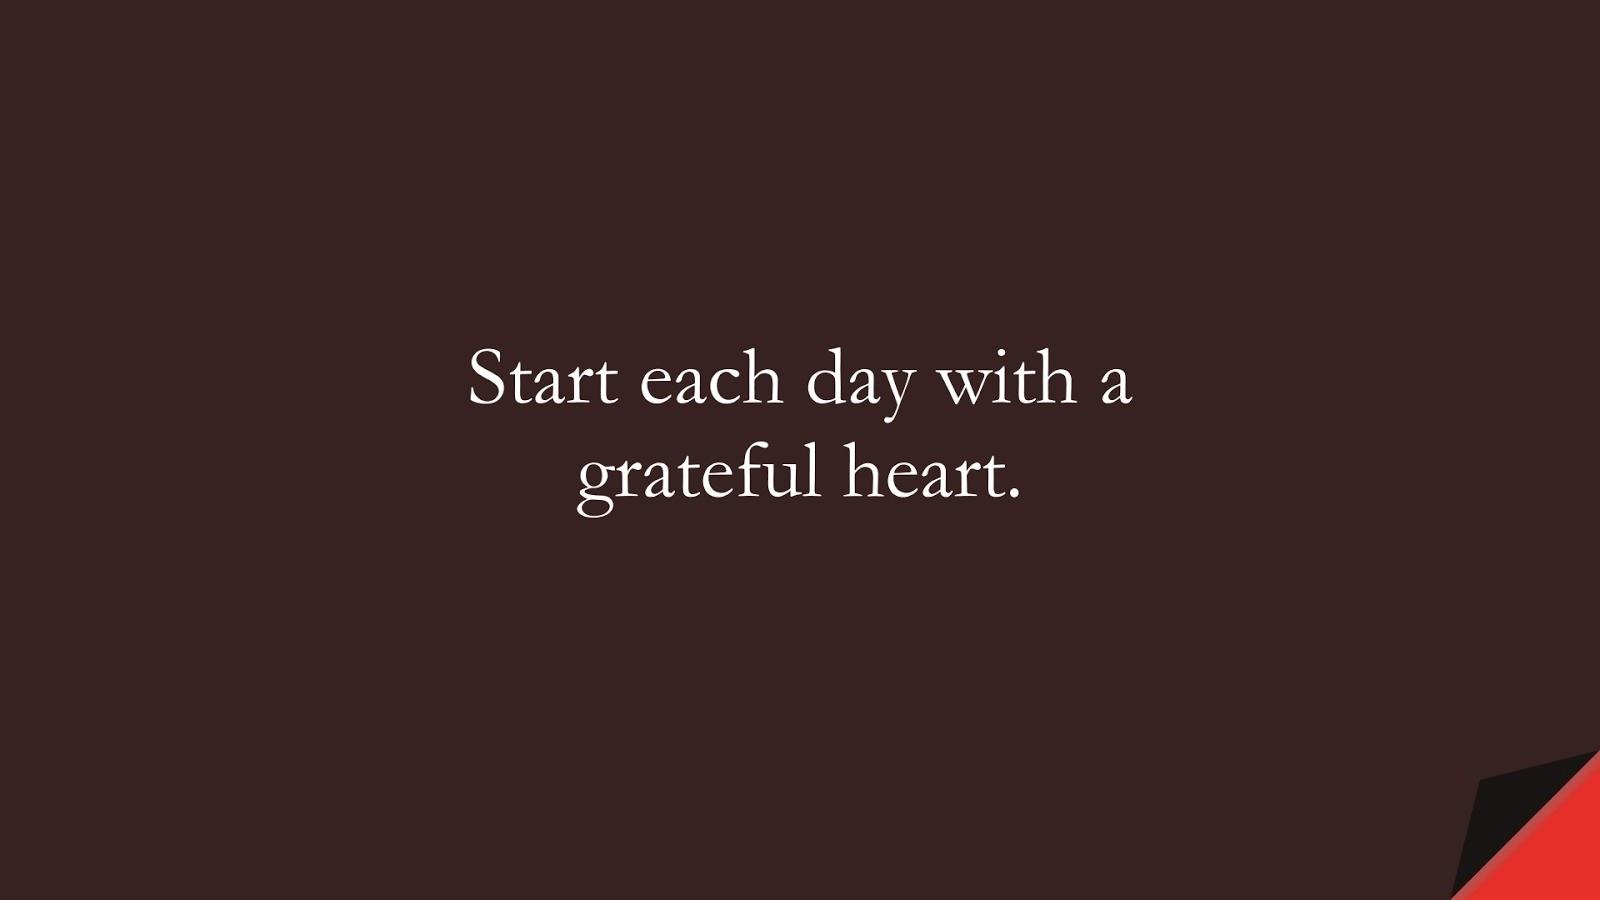 Start each day with a grateful heart.FALSE